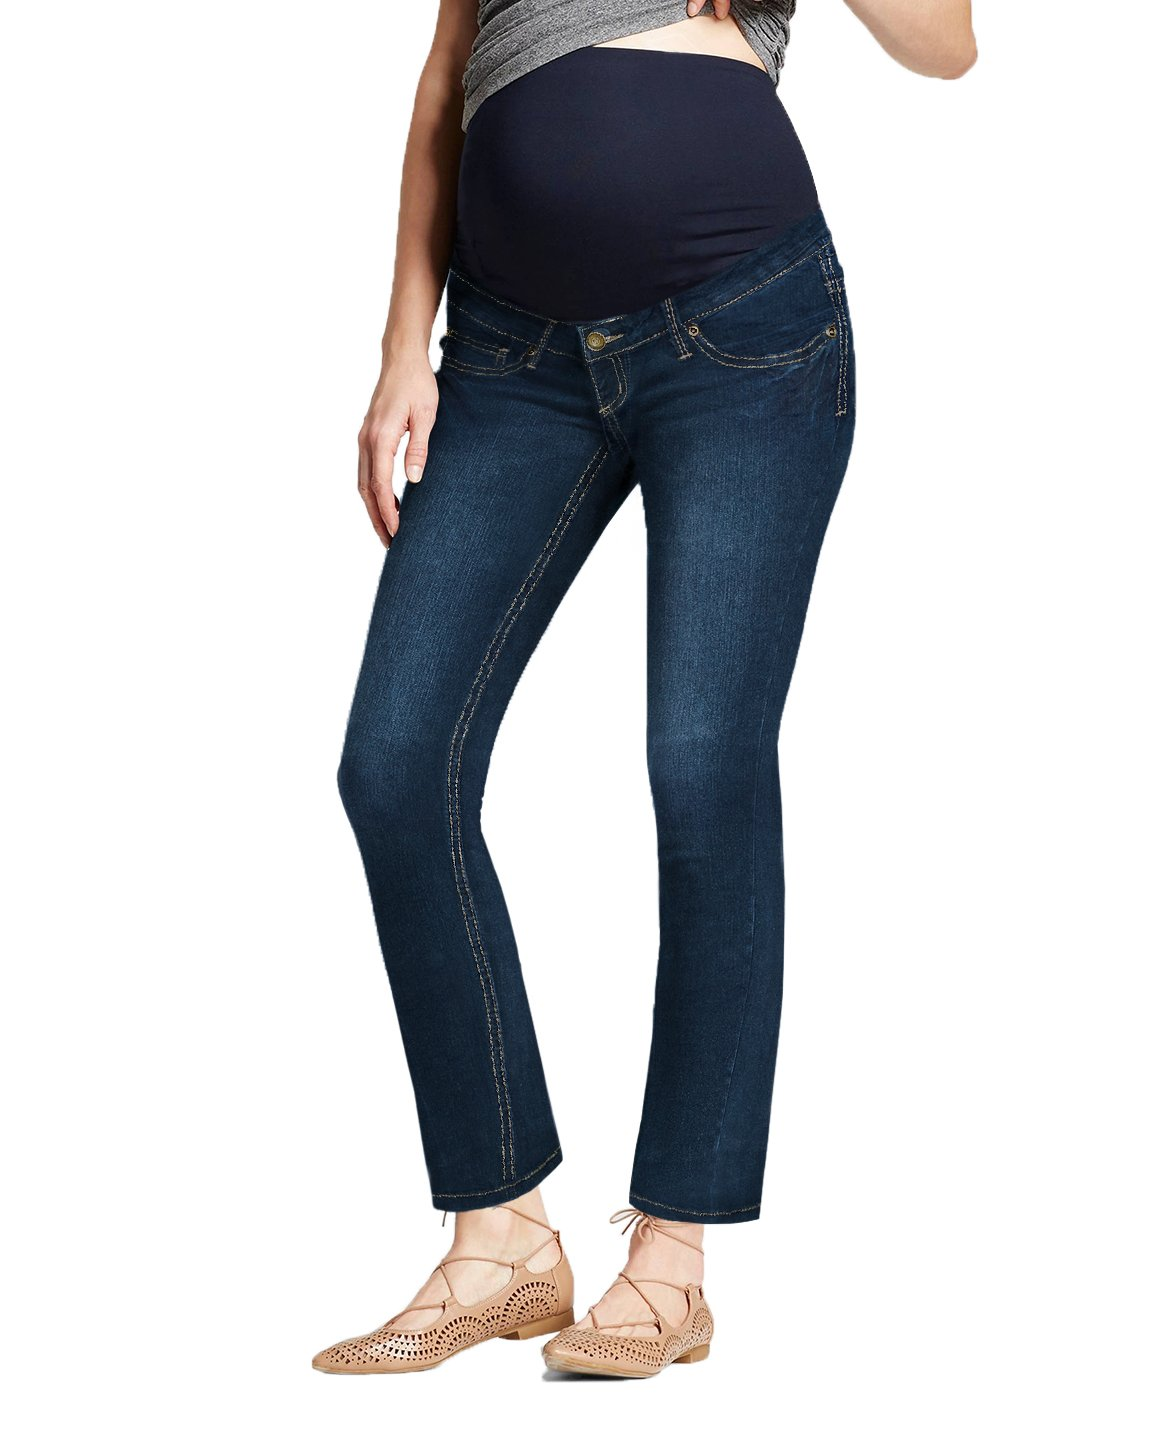 HyBrid & Company Super Comfy Stretch Women's Maternity Bootcut Jeans PM2835WCX Dark WASH2 1X